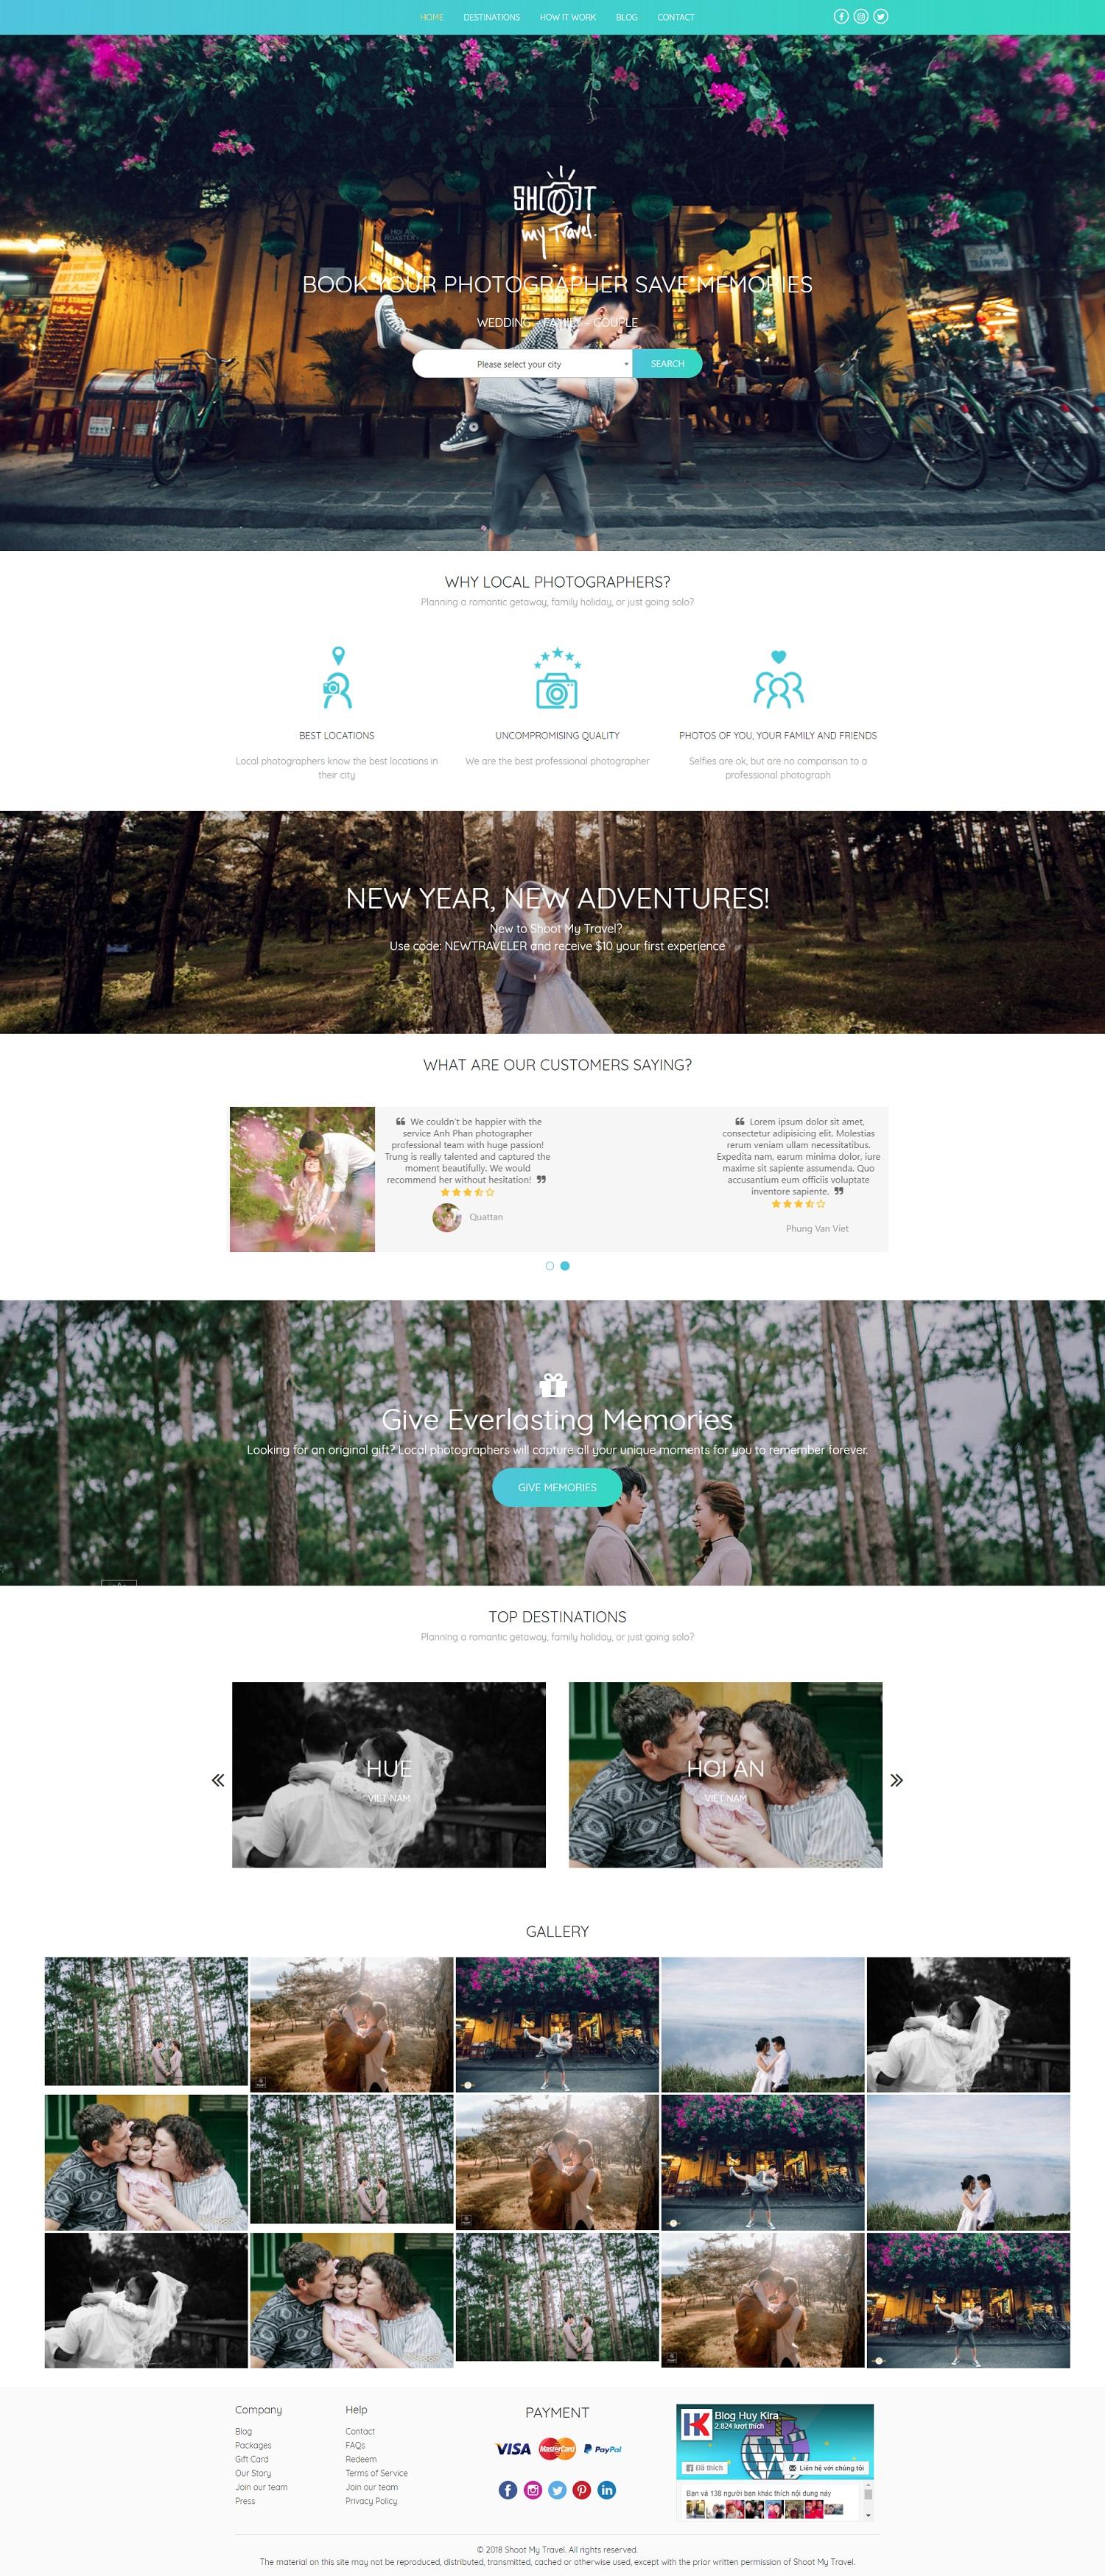 Mẫu website dịch vụ chụp ảnh